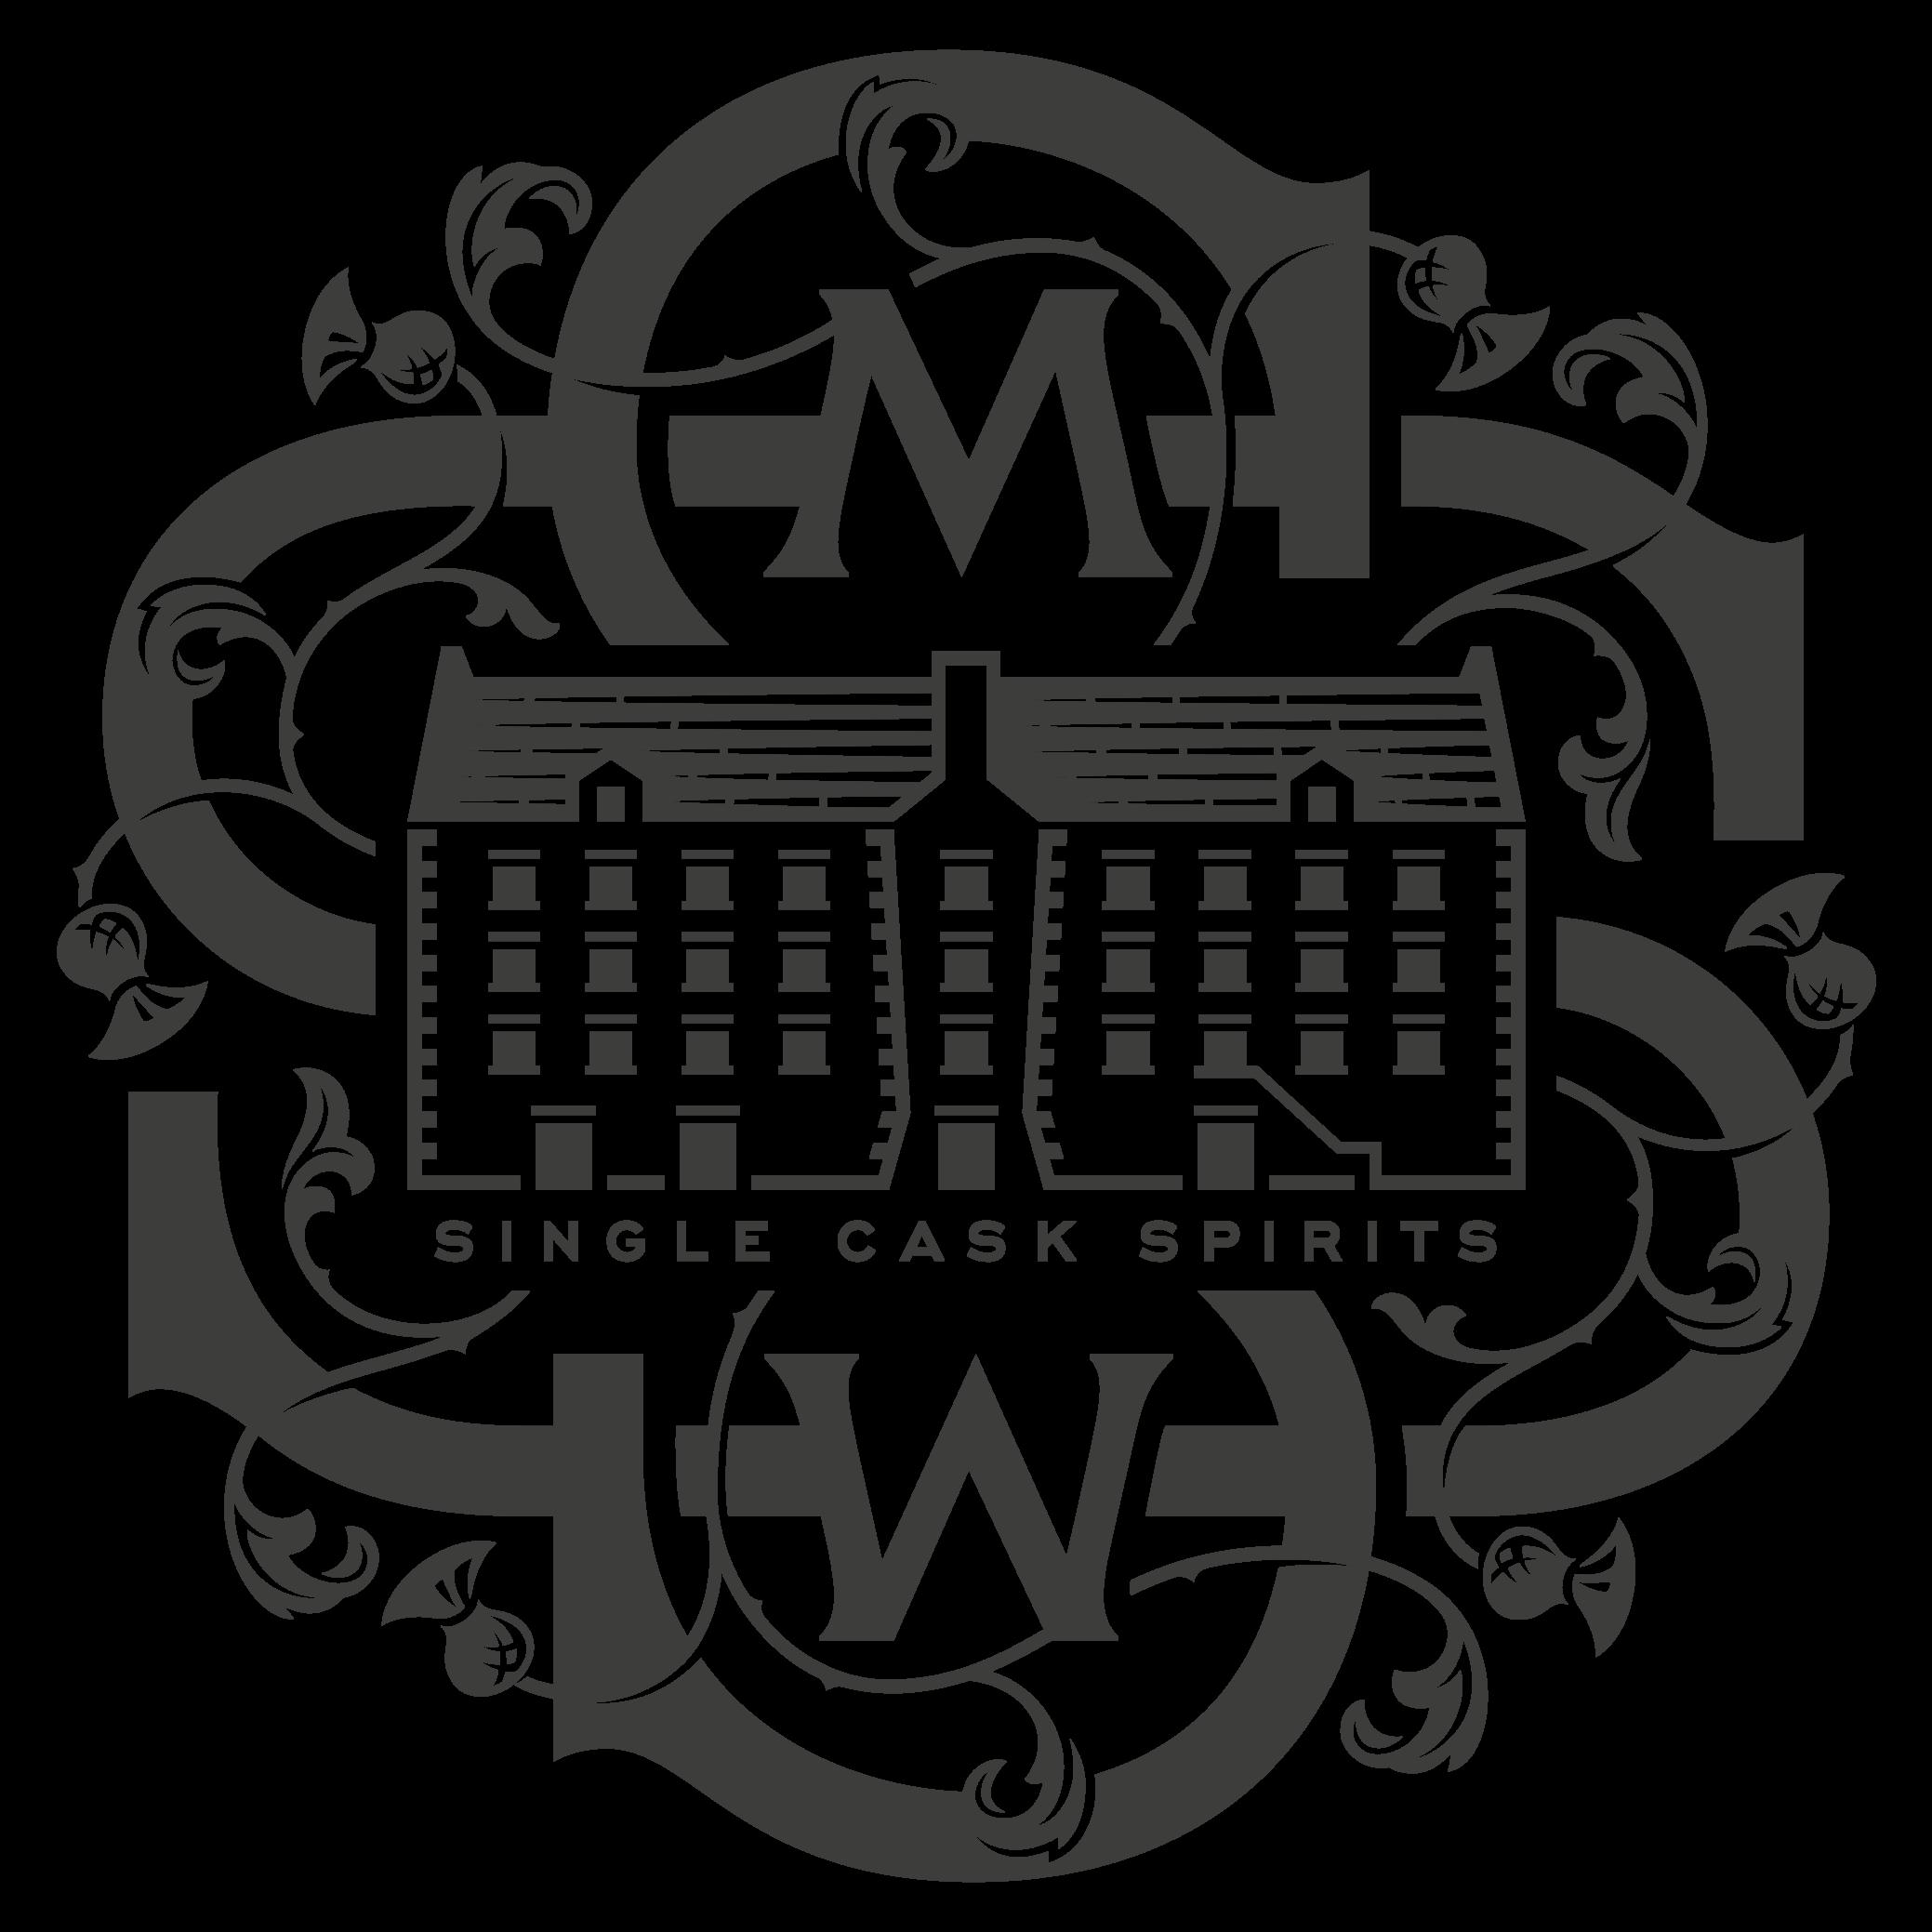 The Scotch Malt Whisky Society *affiliate link